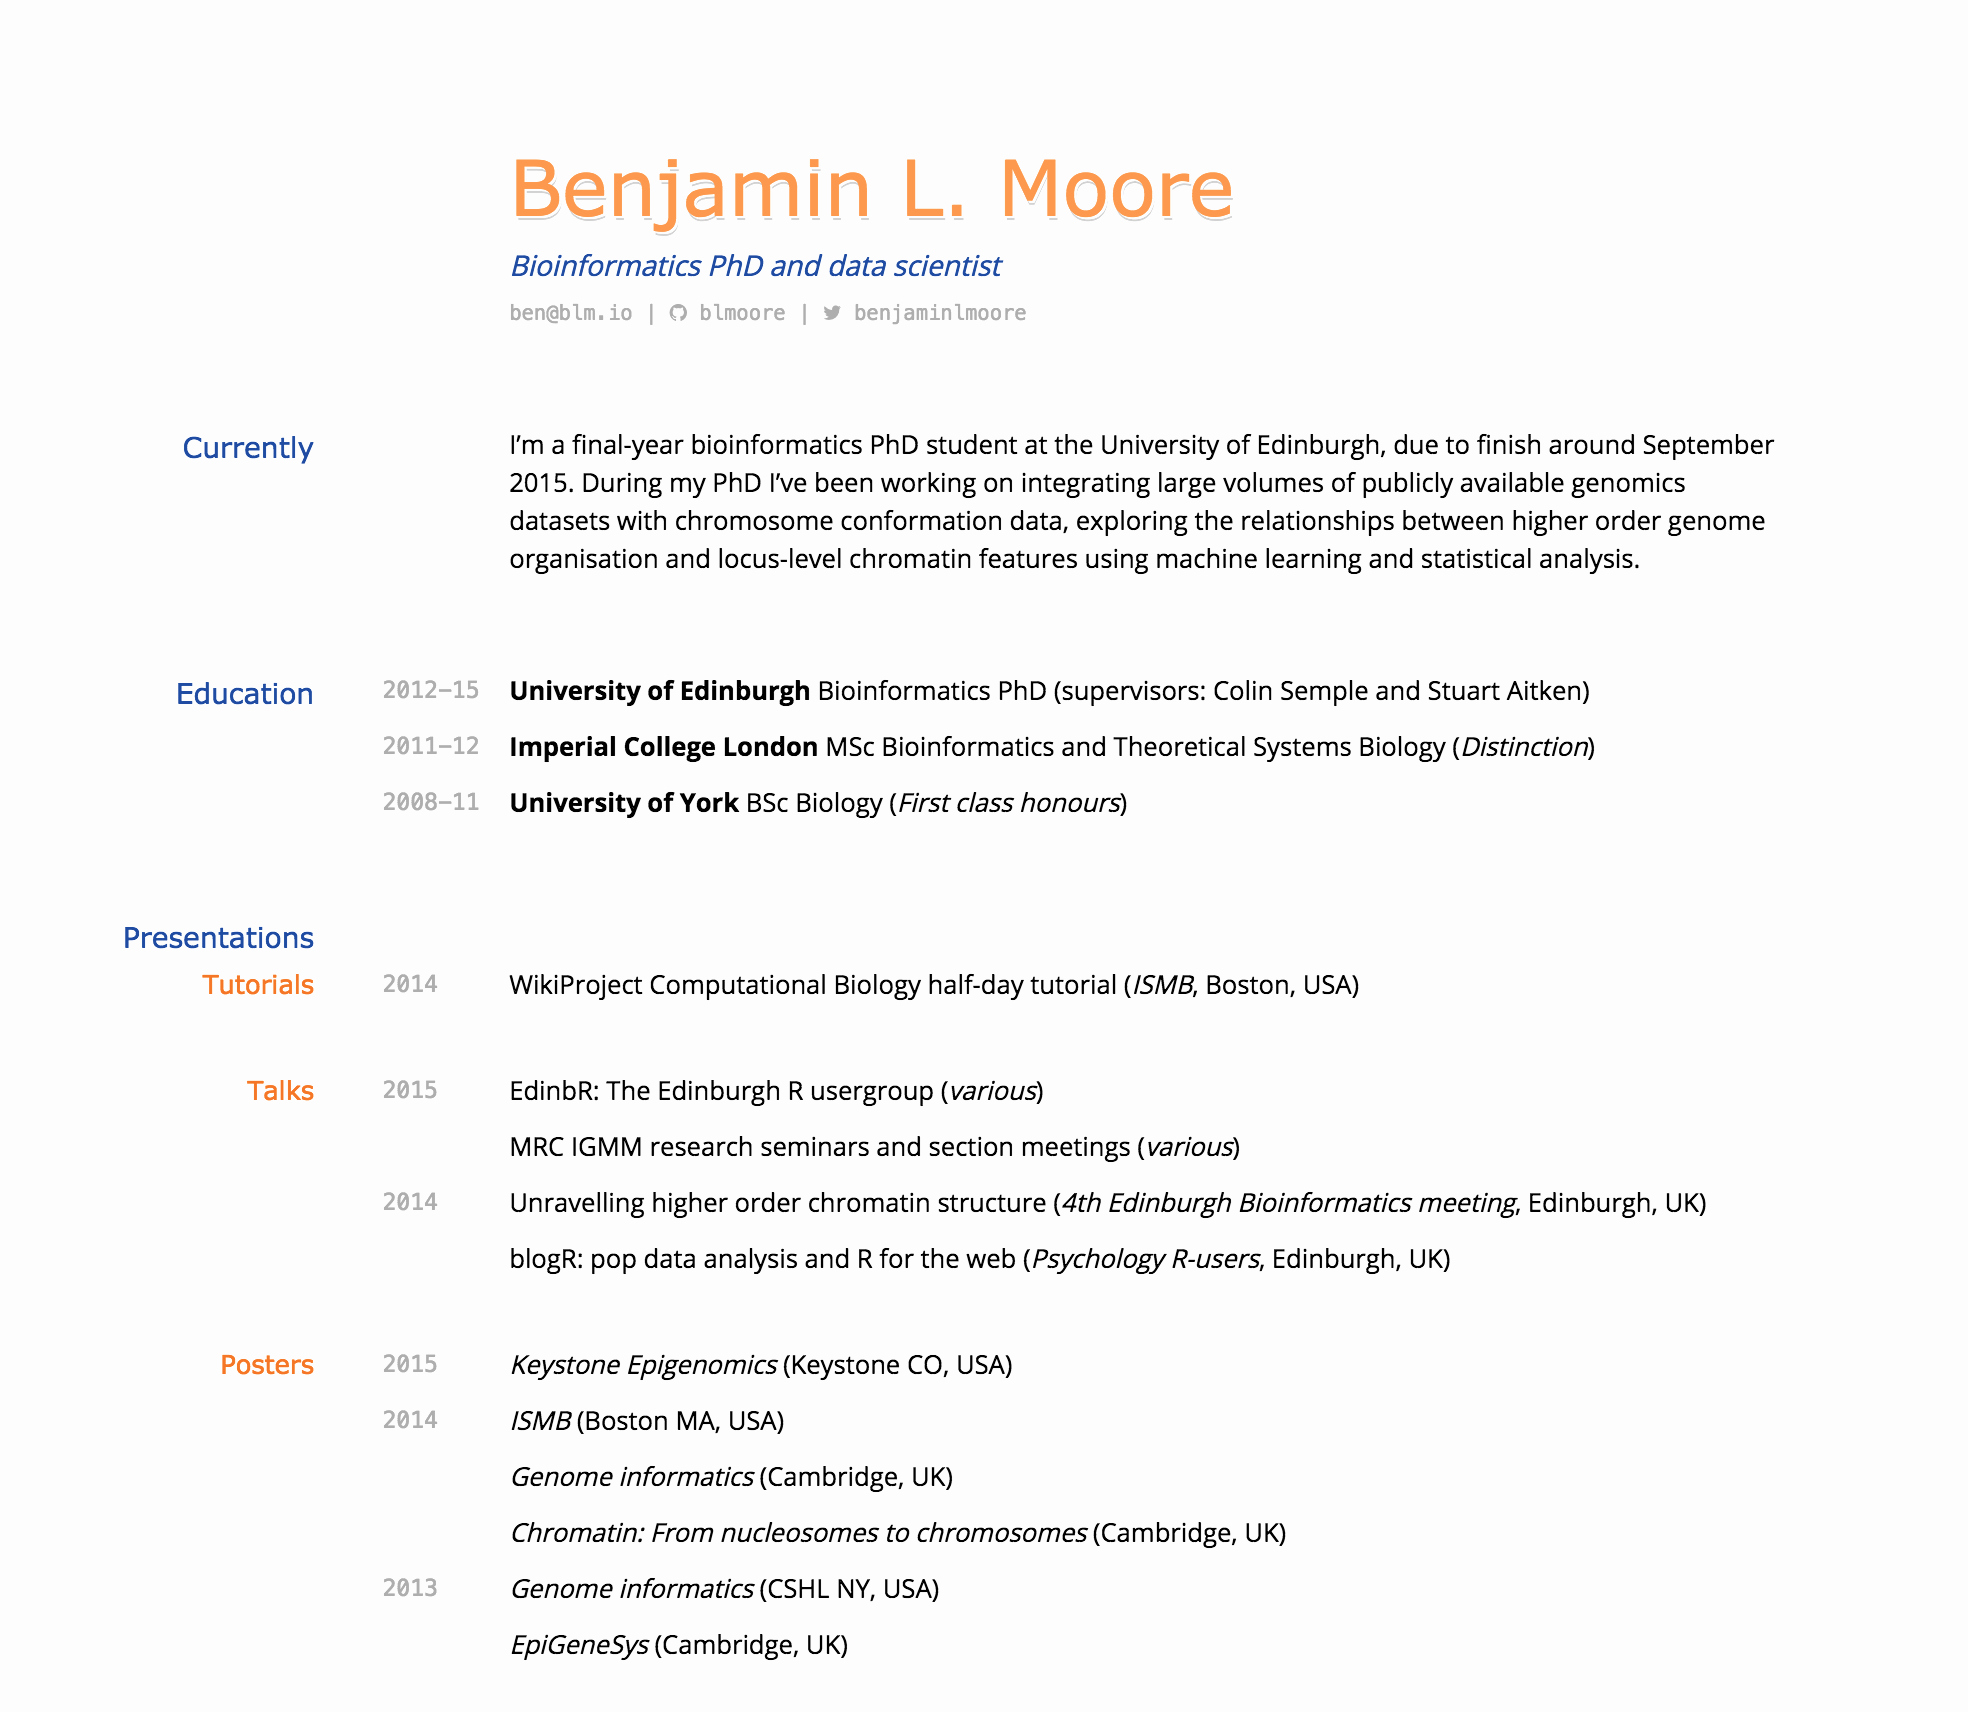 Academic Resume Template Word Elegant Resume Template Academic Word Best S Cv within 81